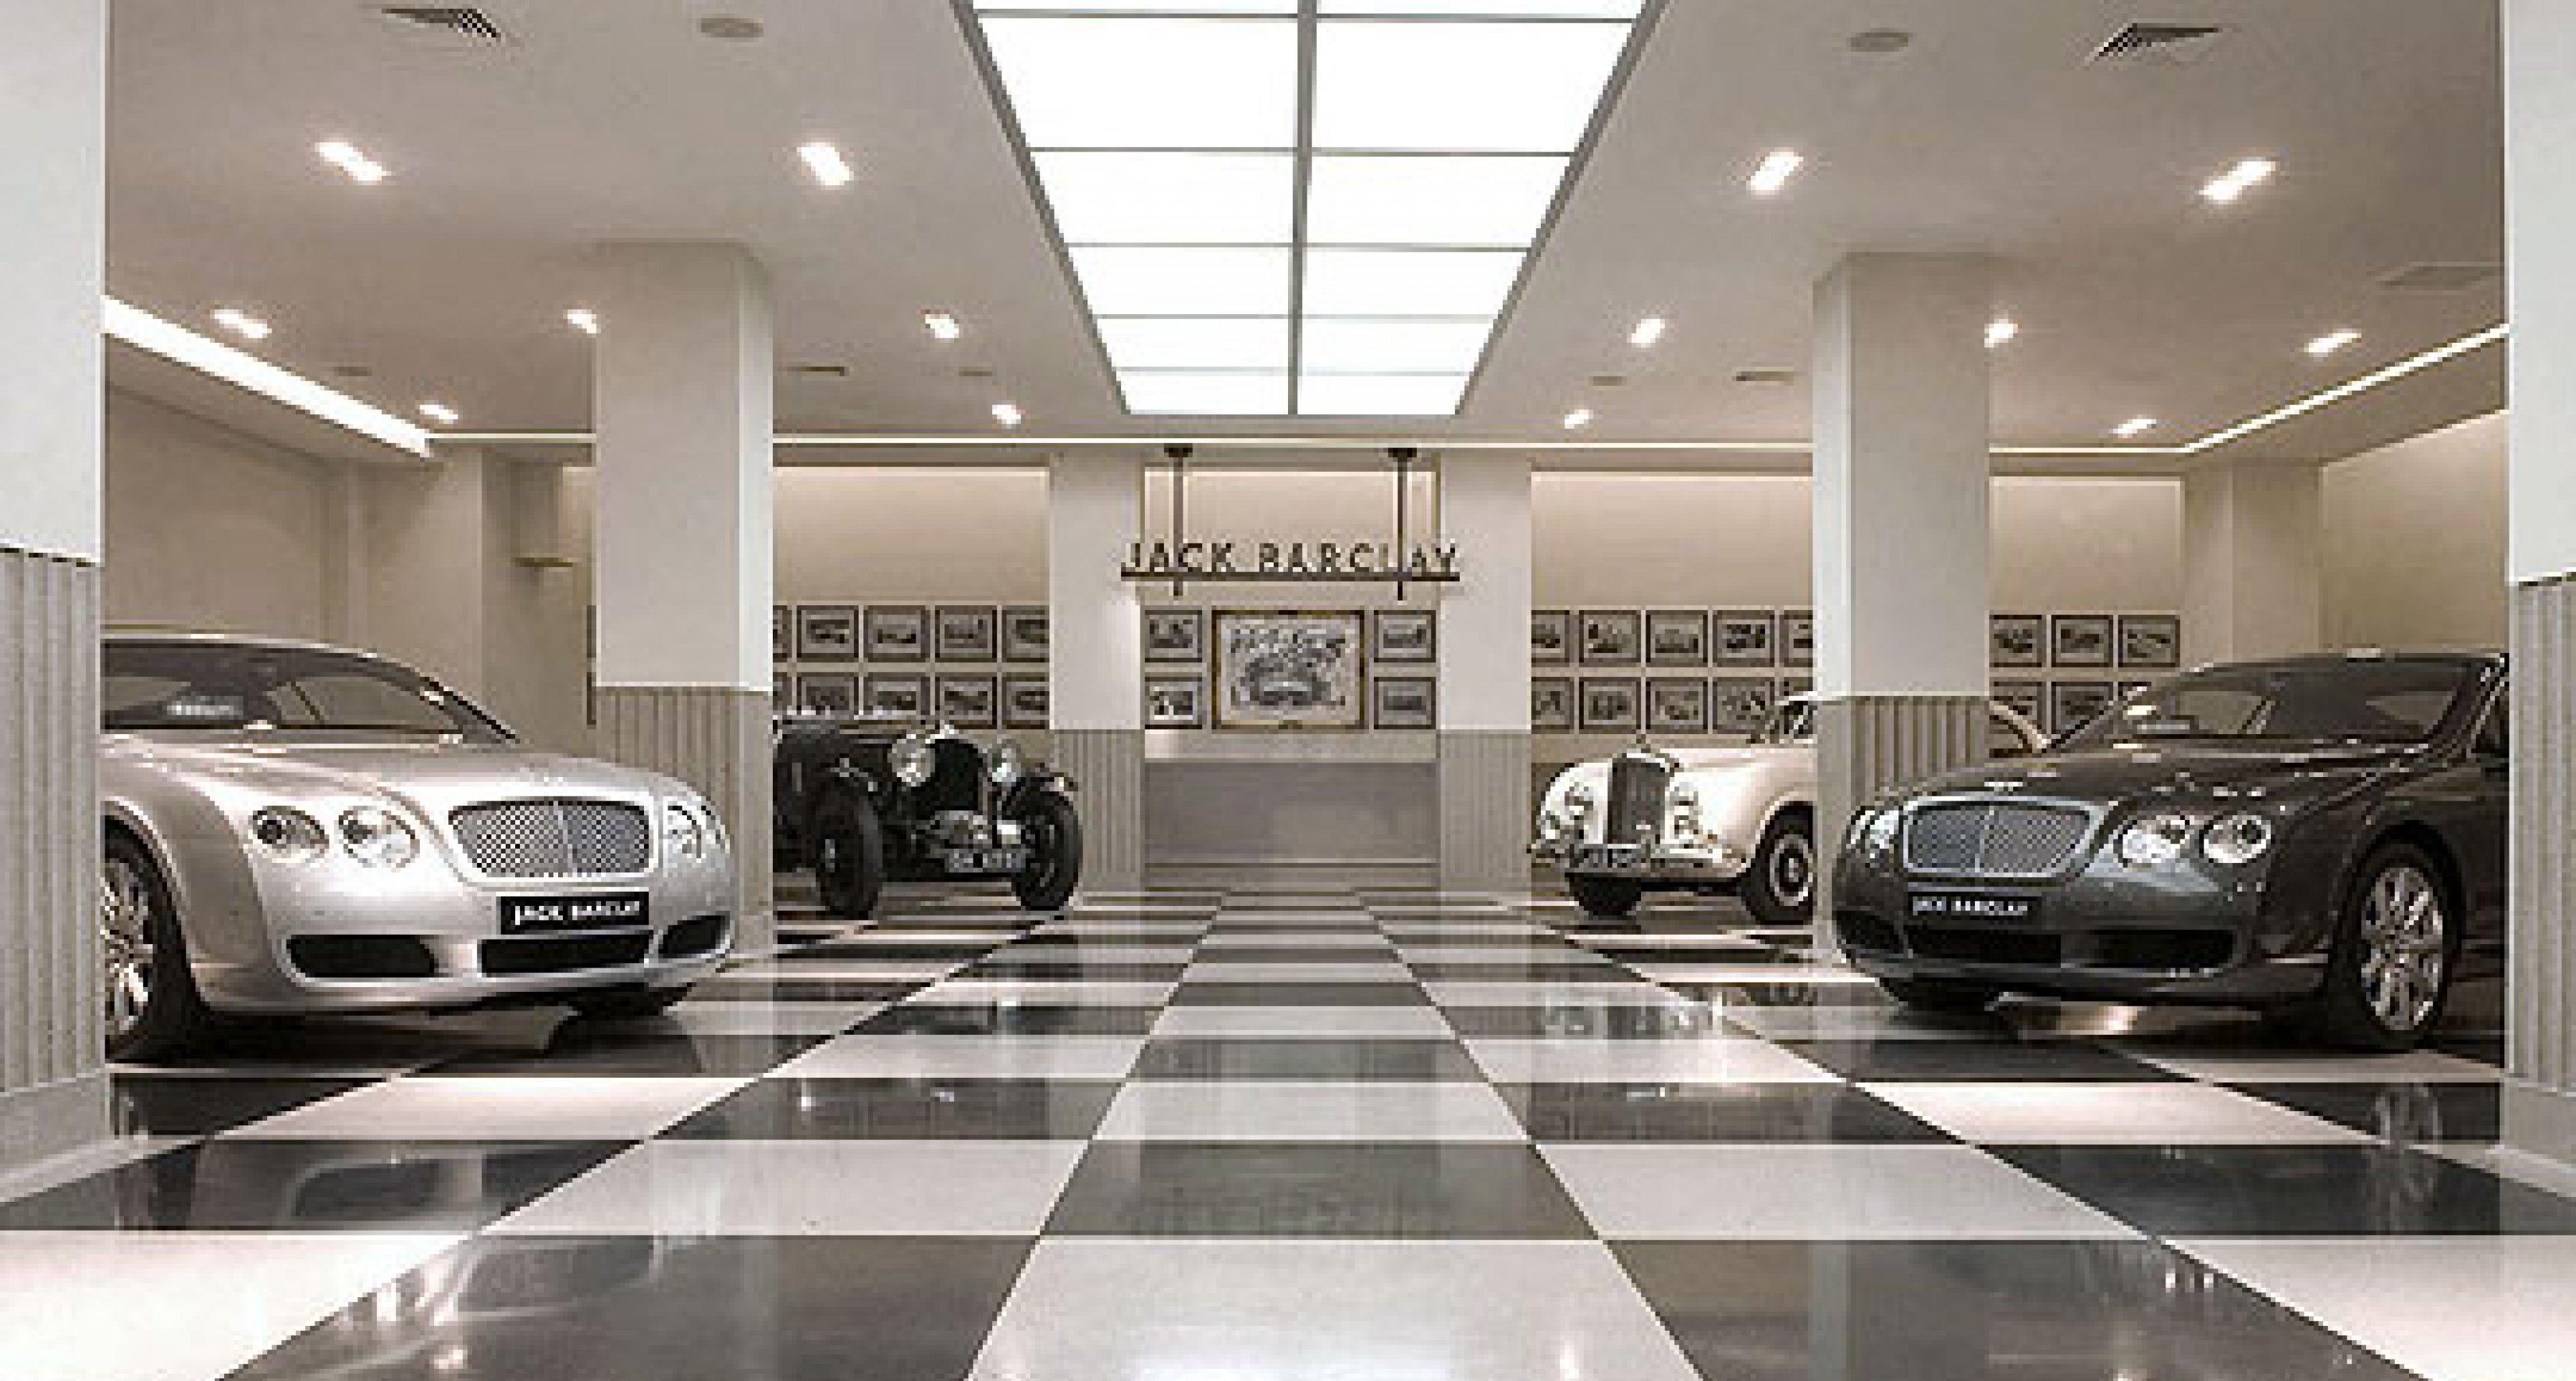 Jack Barclay - London Flagship showroom has £2m refurbishment